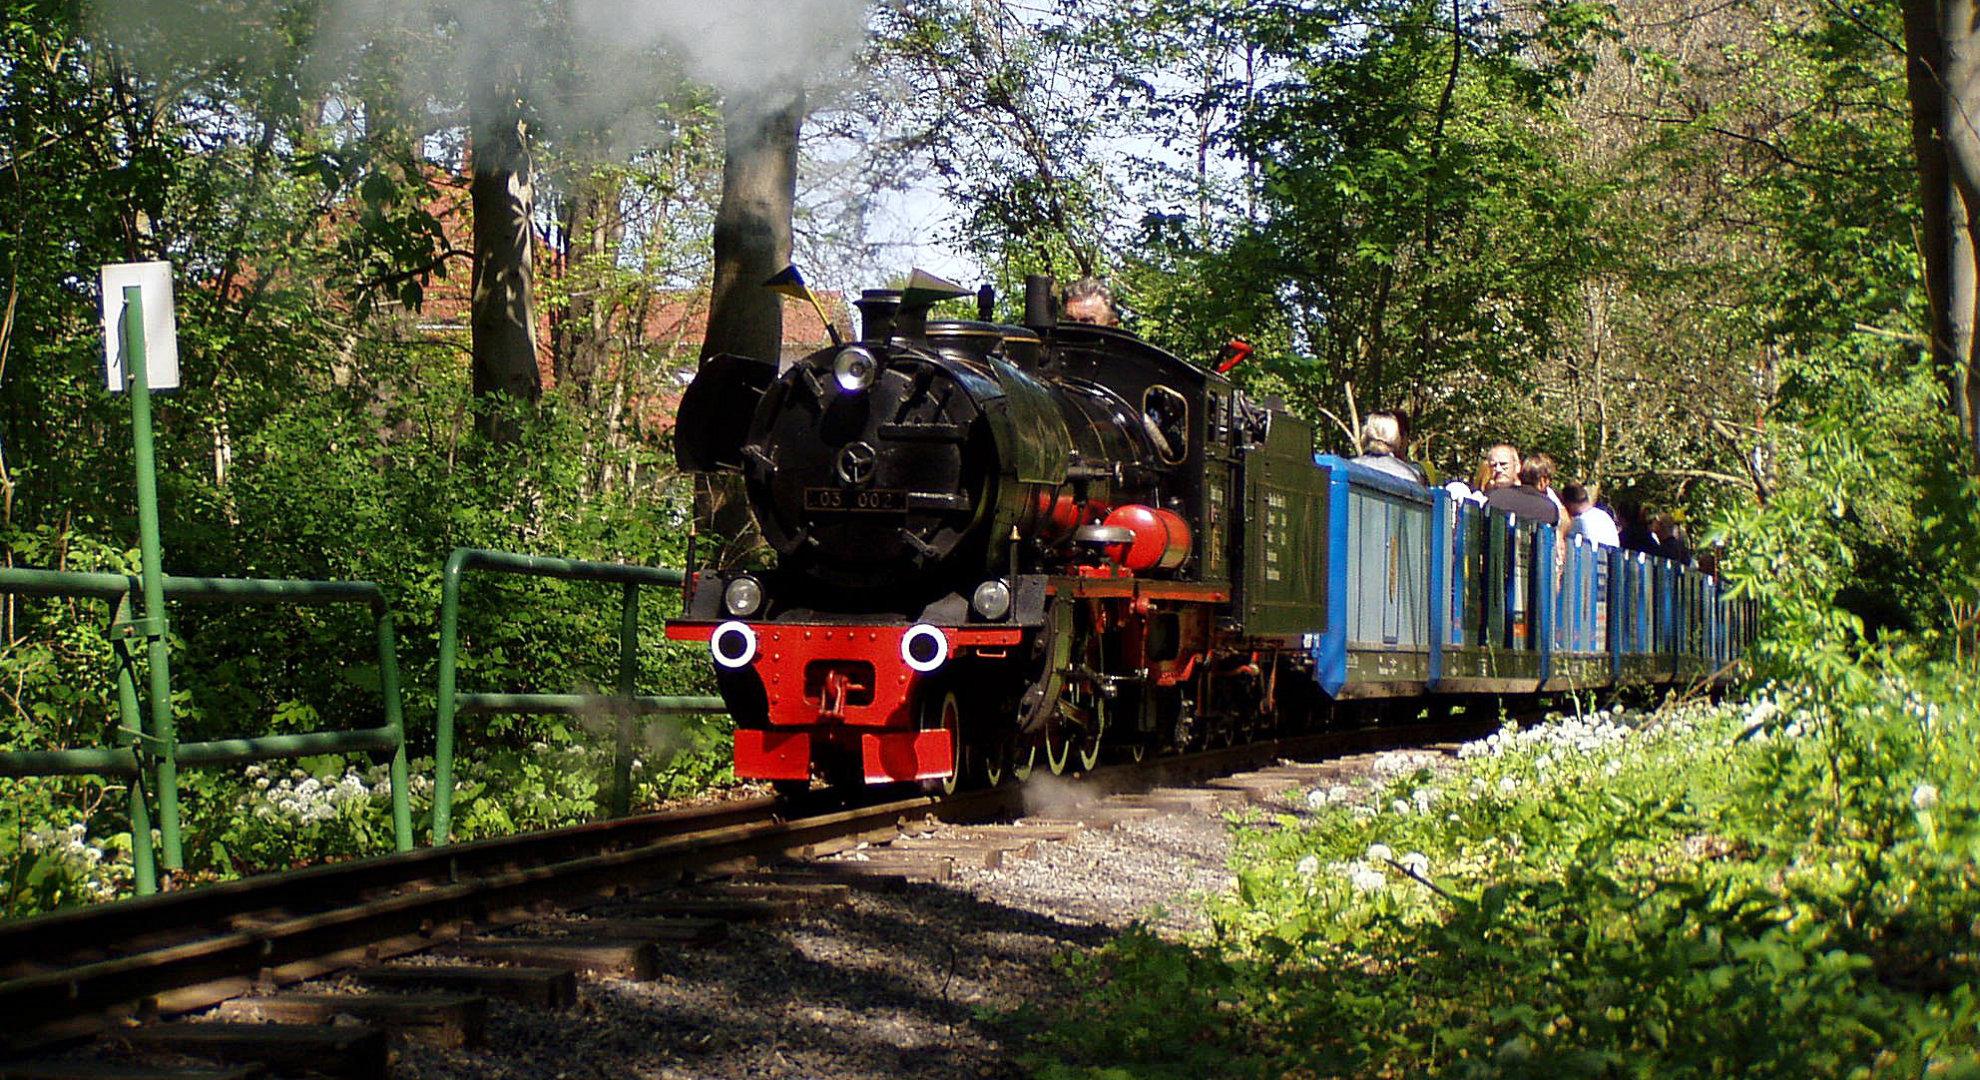 Dampflokomotive am Haltepunkt Elsteraue